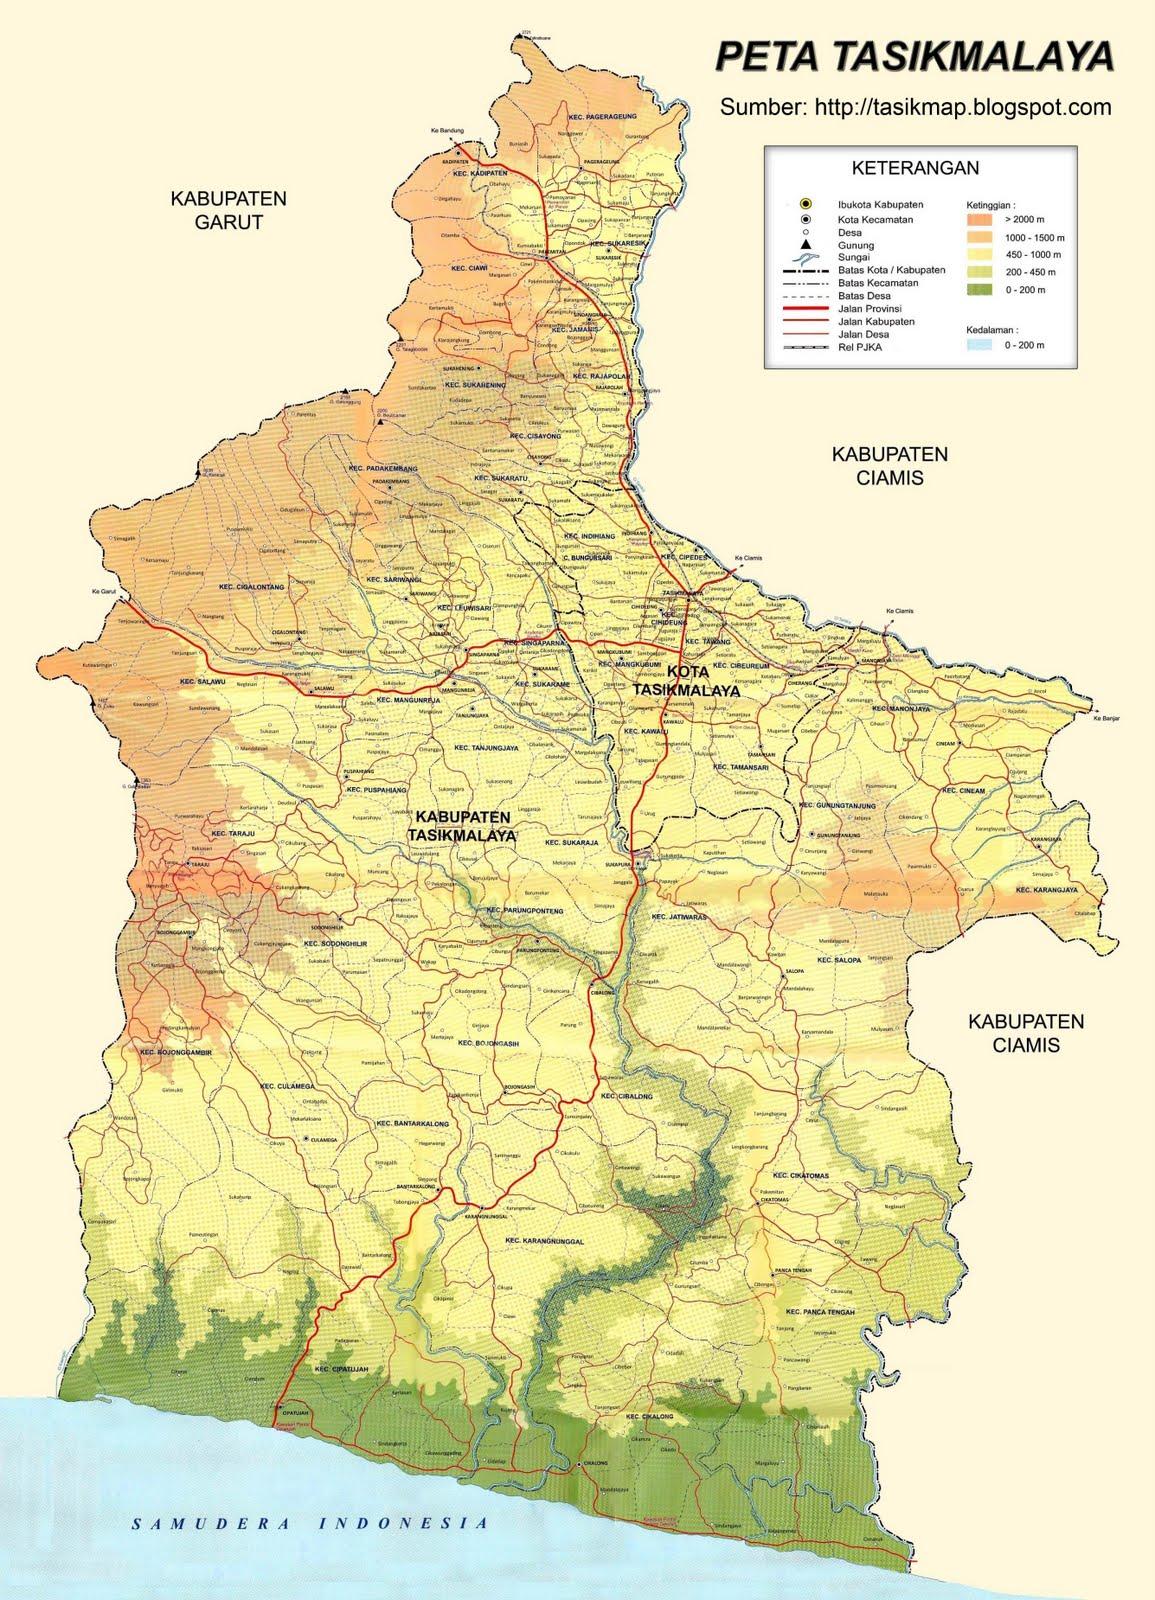 Peta Kabupaten Tasikmalaya